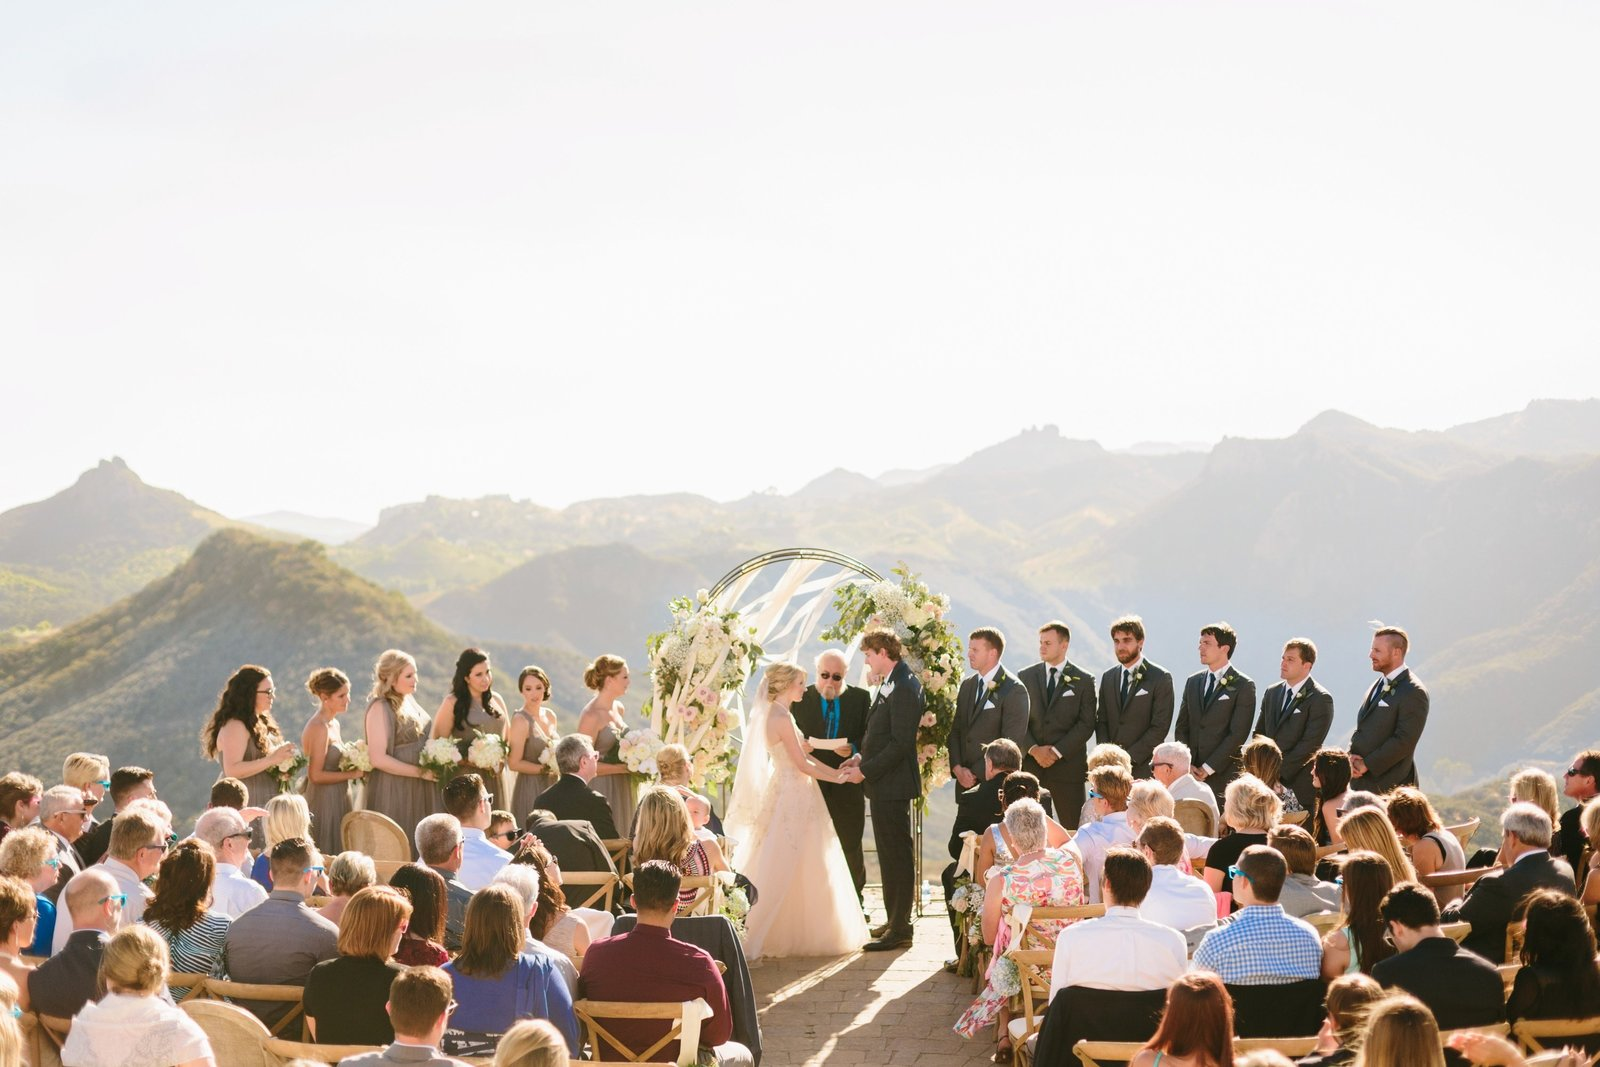 Wedding Photos-Jodee Debes Photography-224